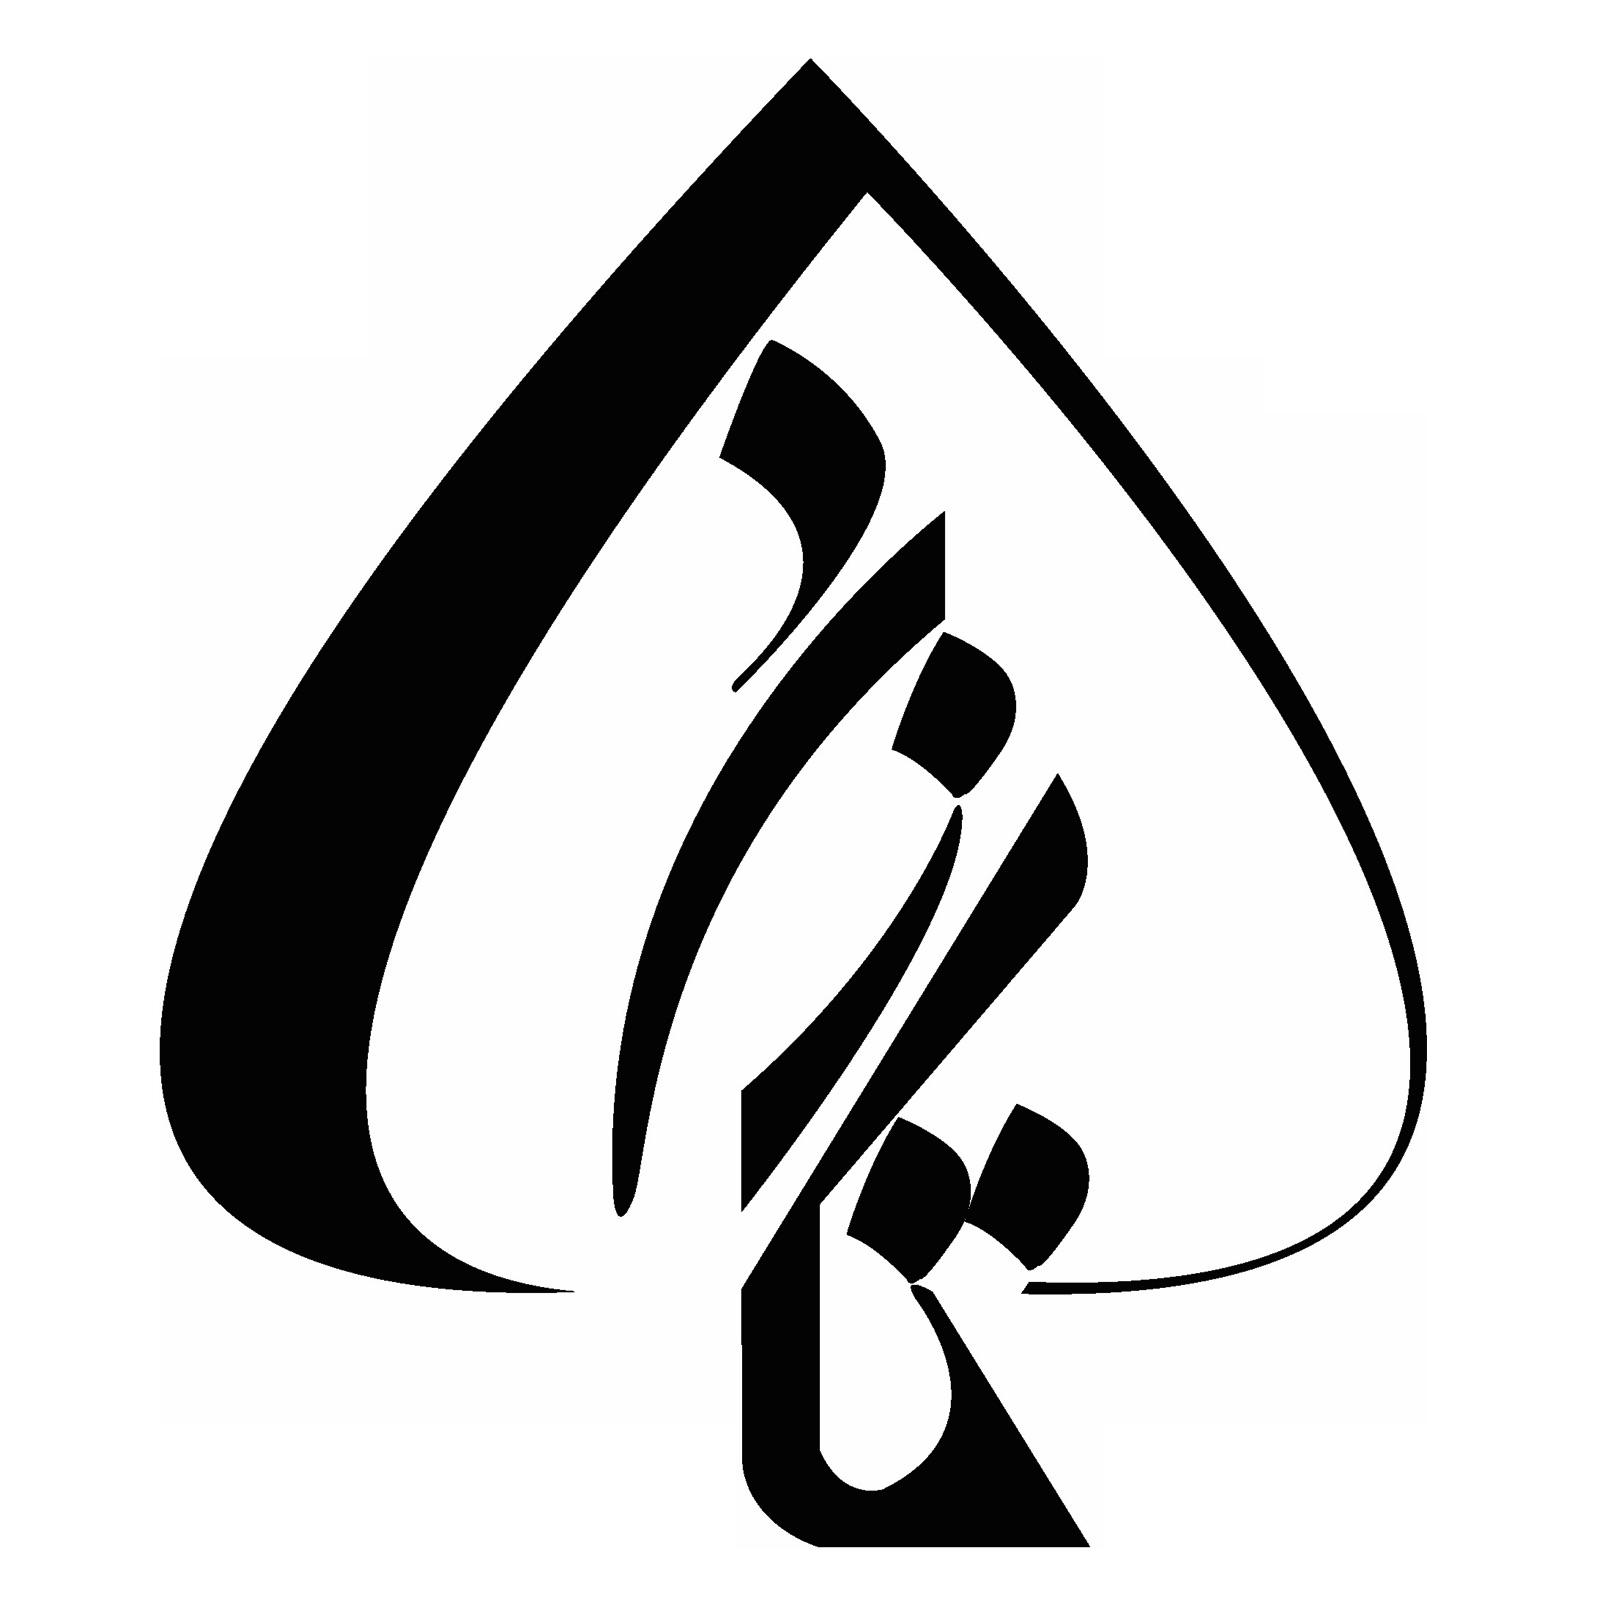 Transparent art show clipart clipart royalty free stock Shiraz Music Art Architecture Love - talent show clipart png ... clipart royalty free stock